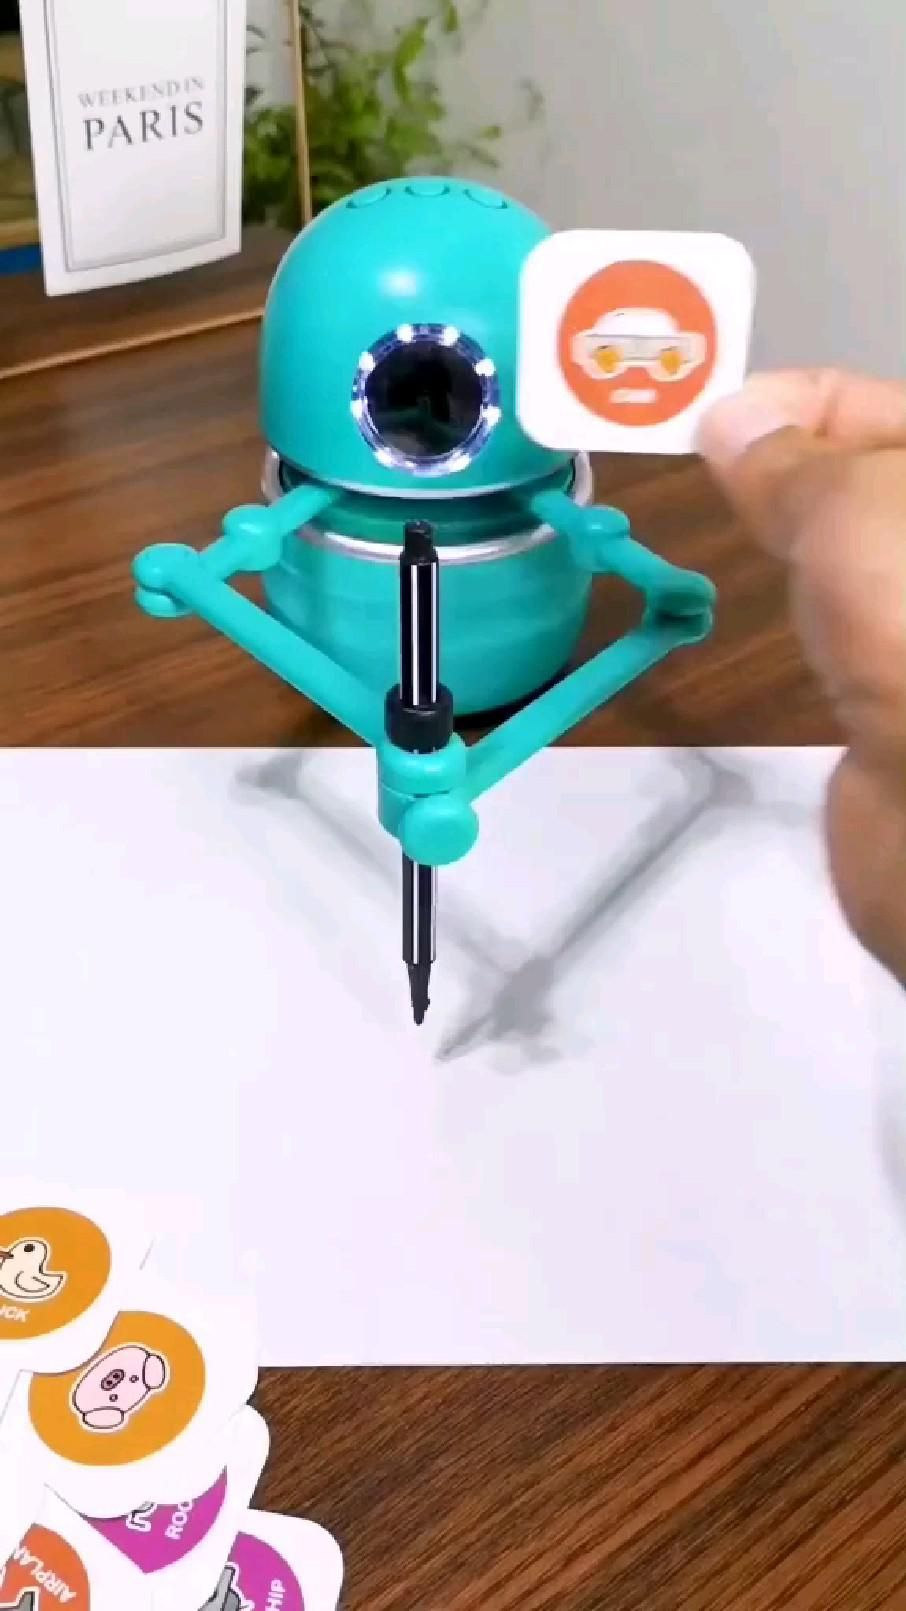 Drawing robot Best drawing robot robotics Futuristic technology Latest gadgets